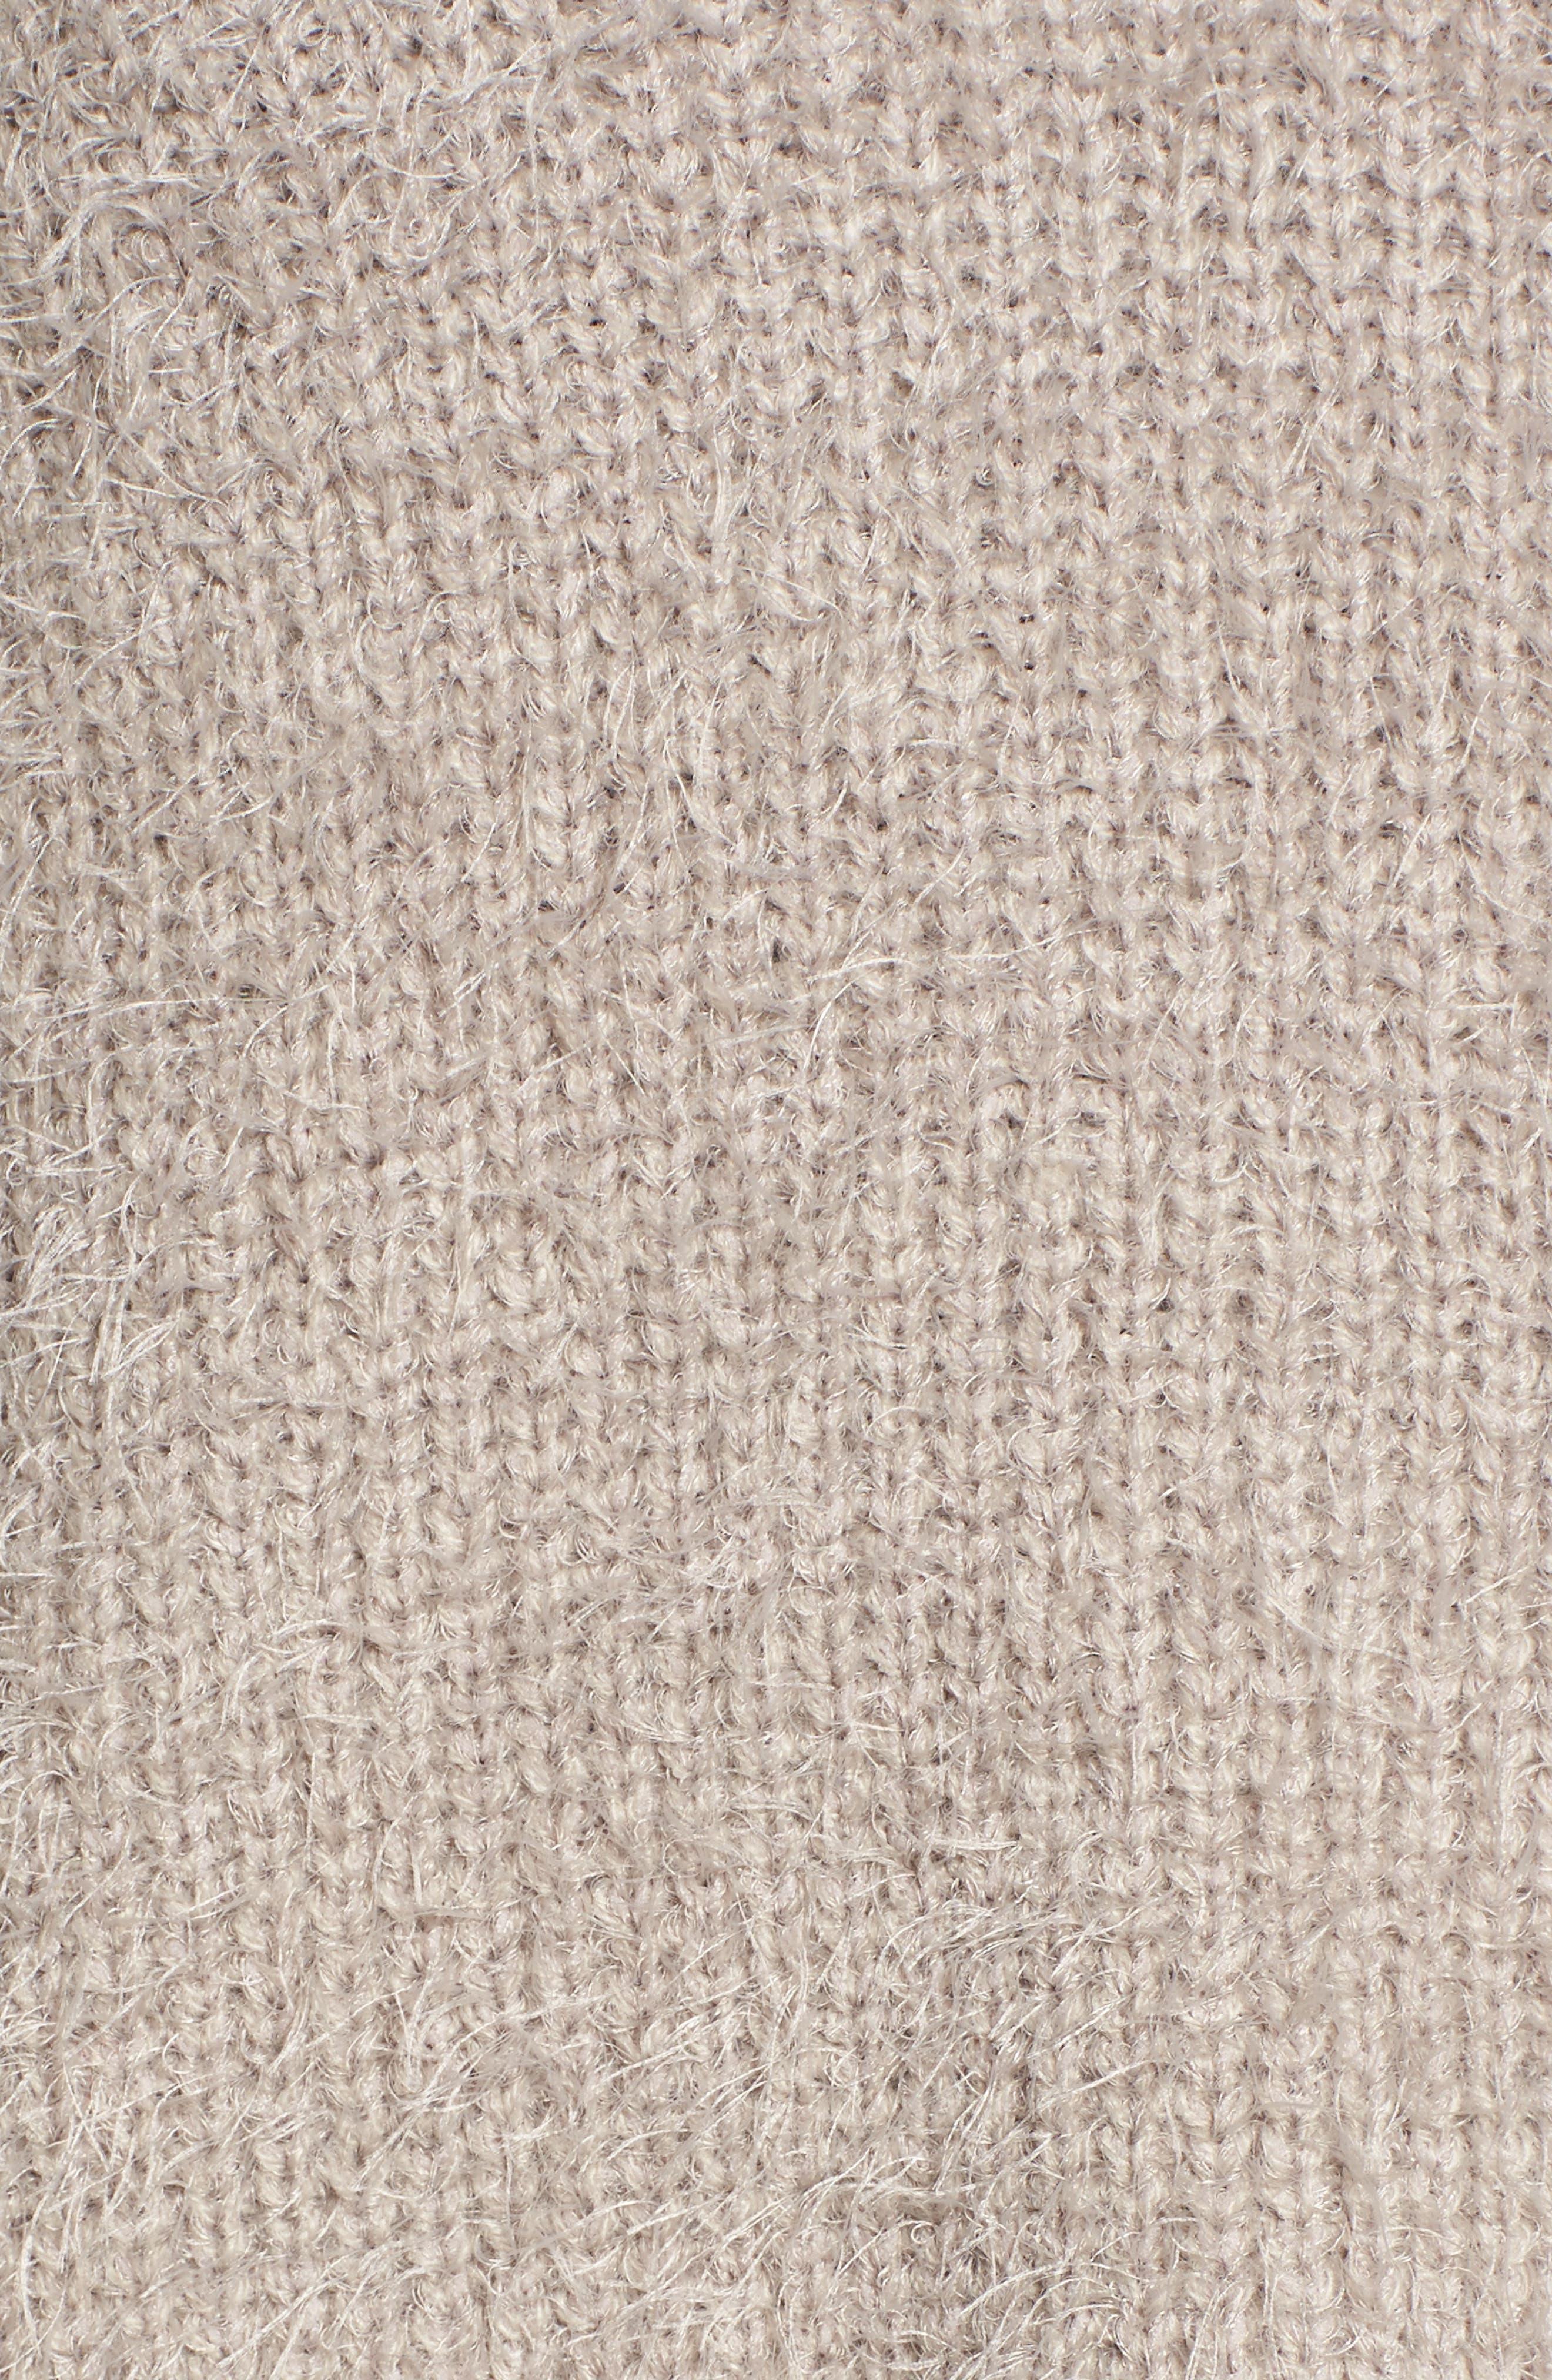 Eyelash Knit Hooded Sweater,                             Alternate thumbnail 5, color,                             260